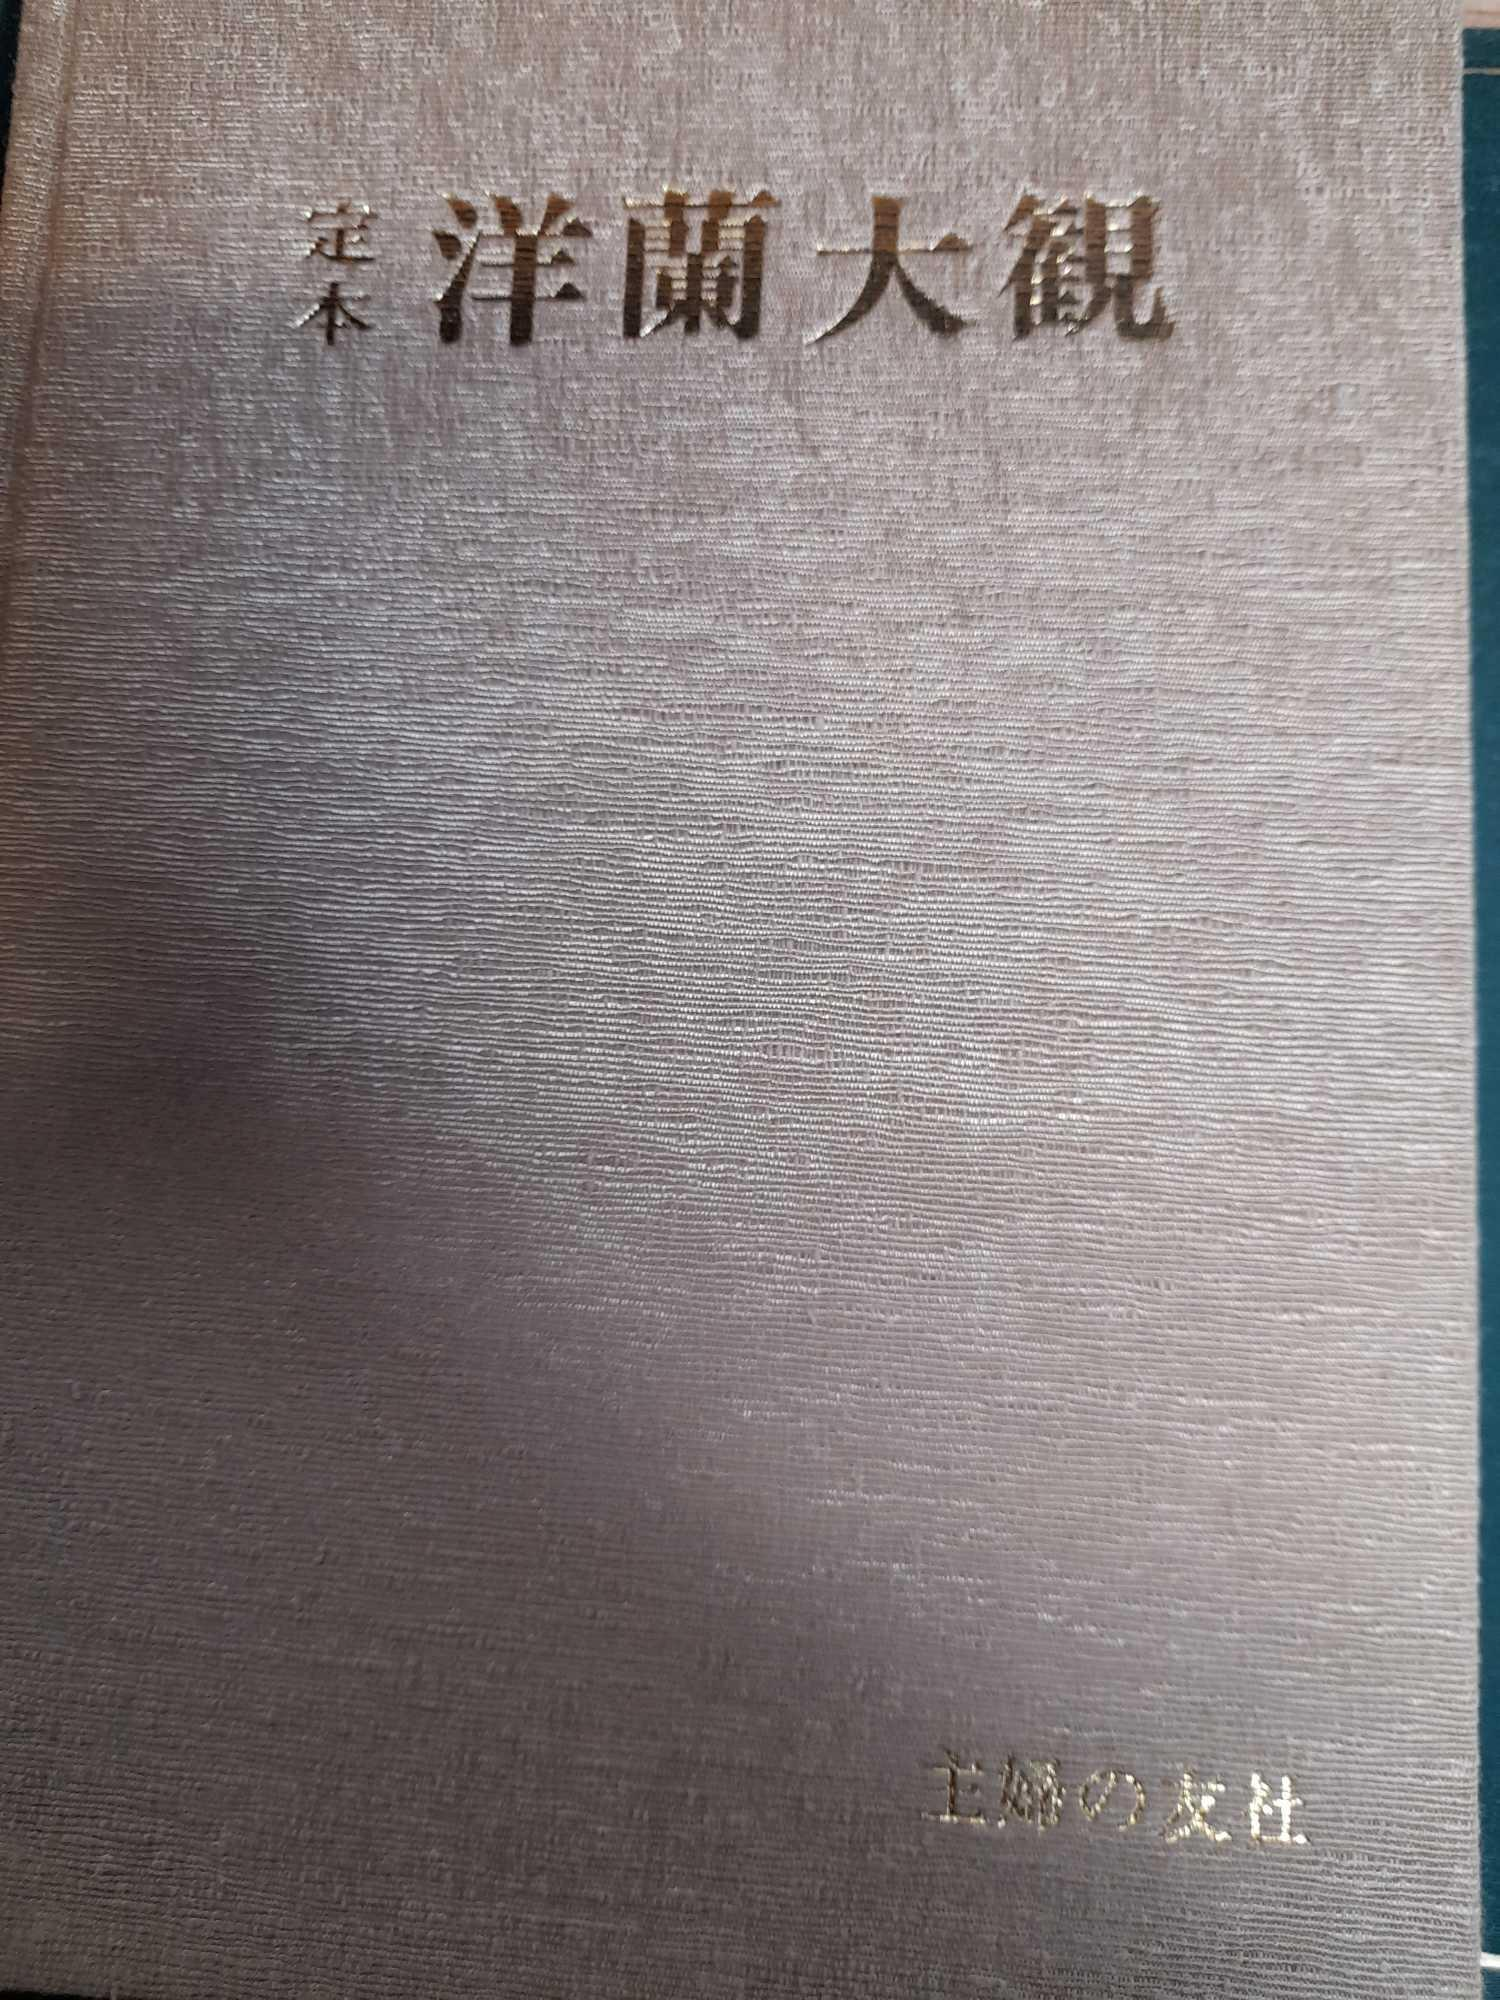 2 ORIENTAL BOOKS - Image 2 of 14